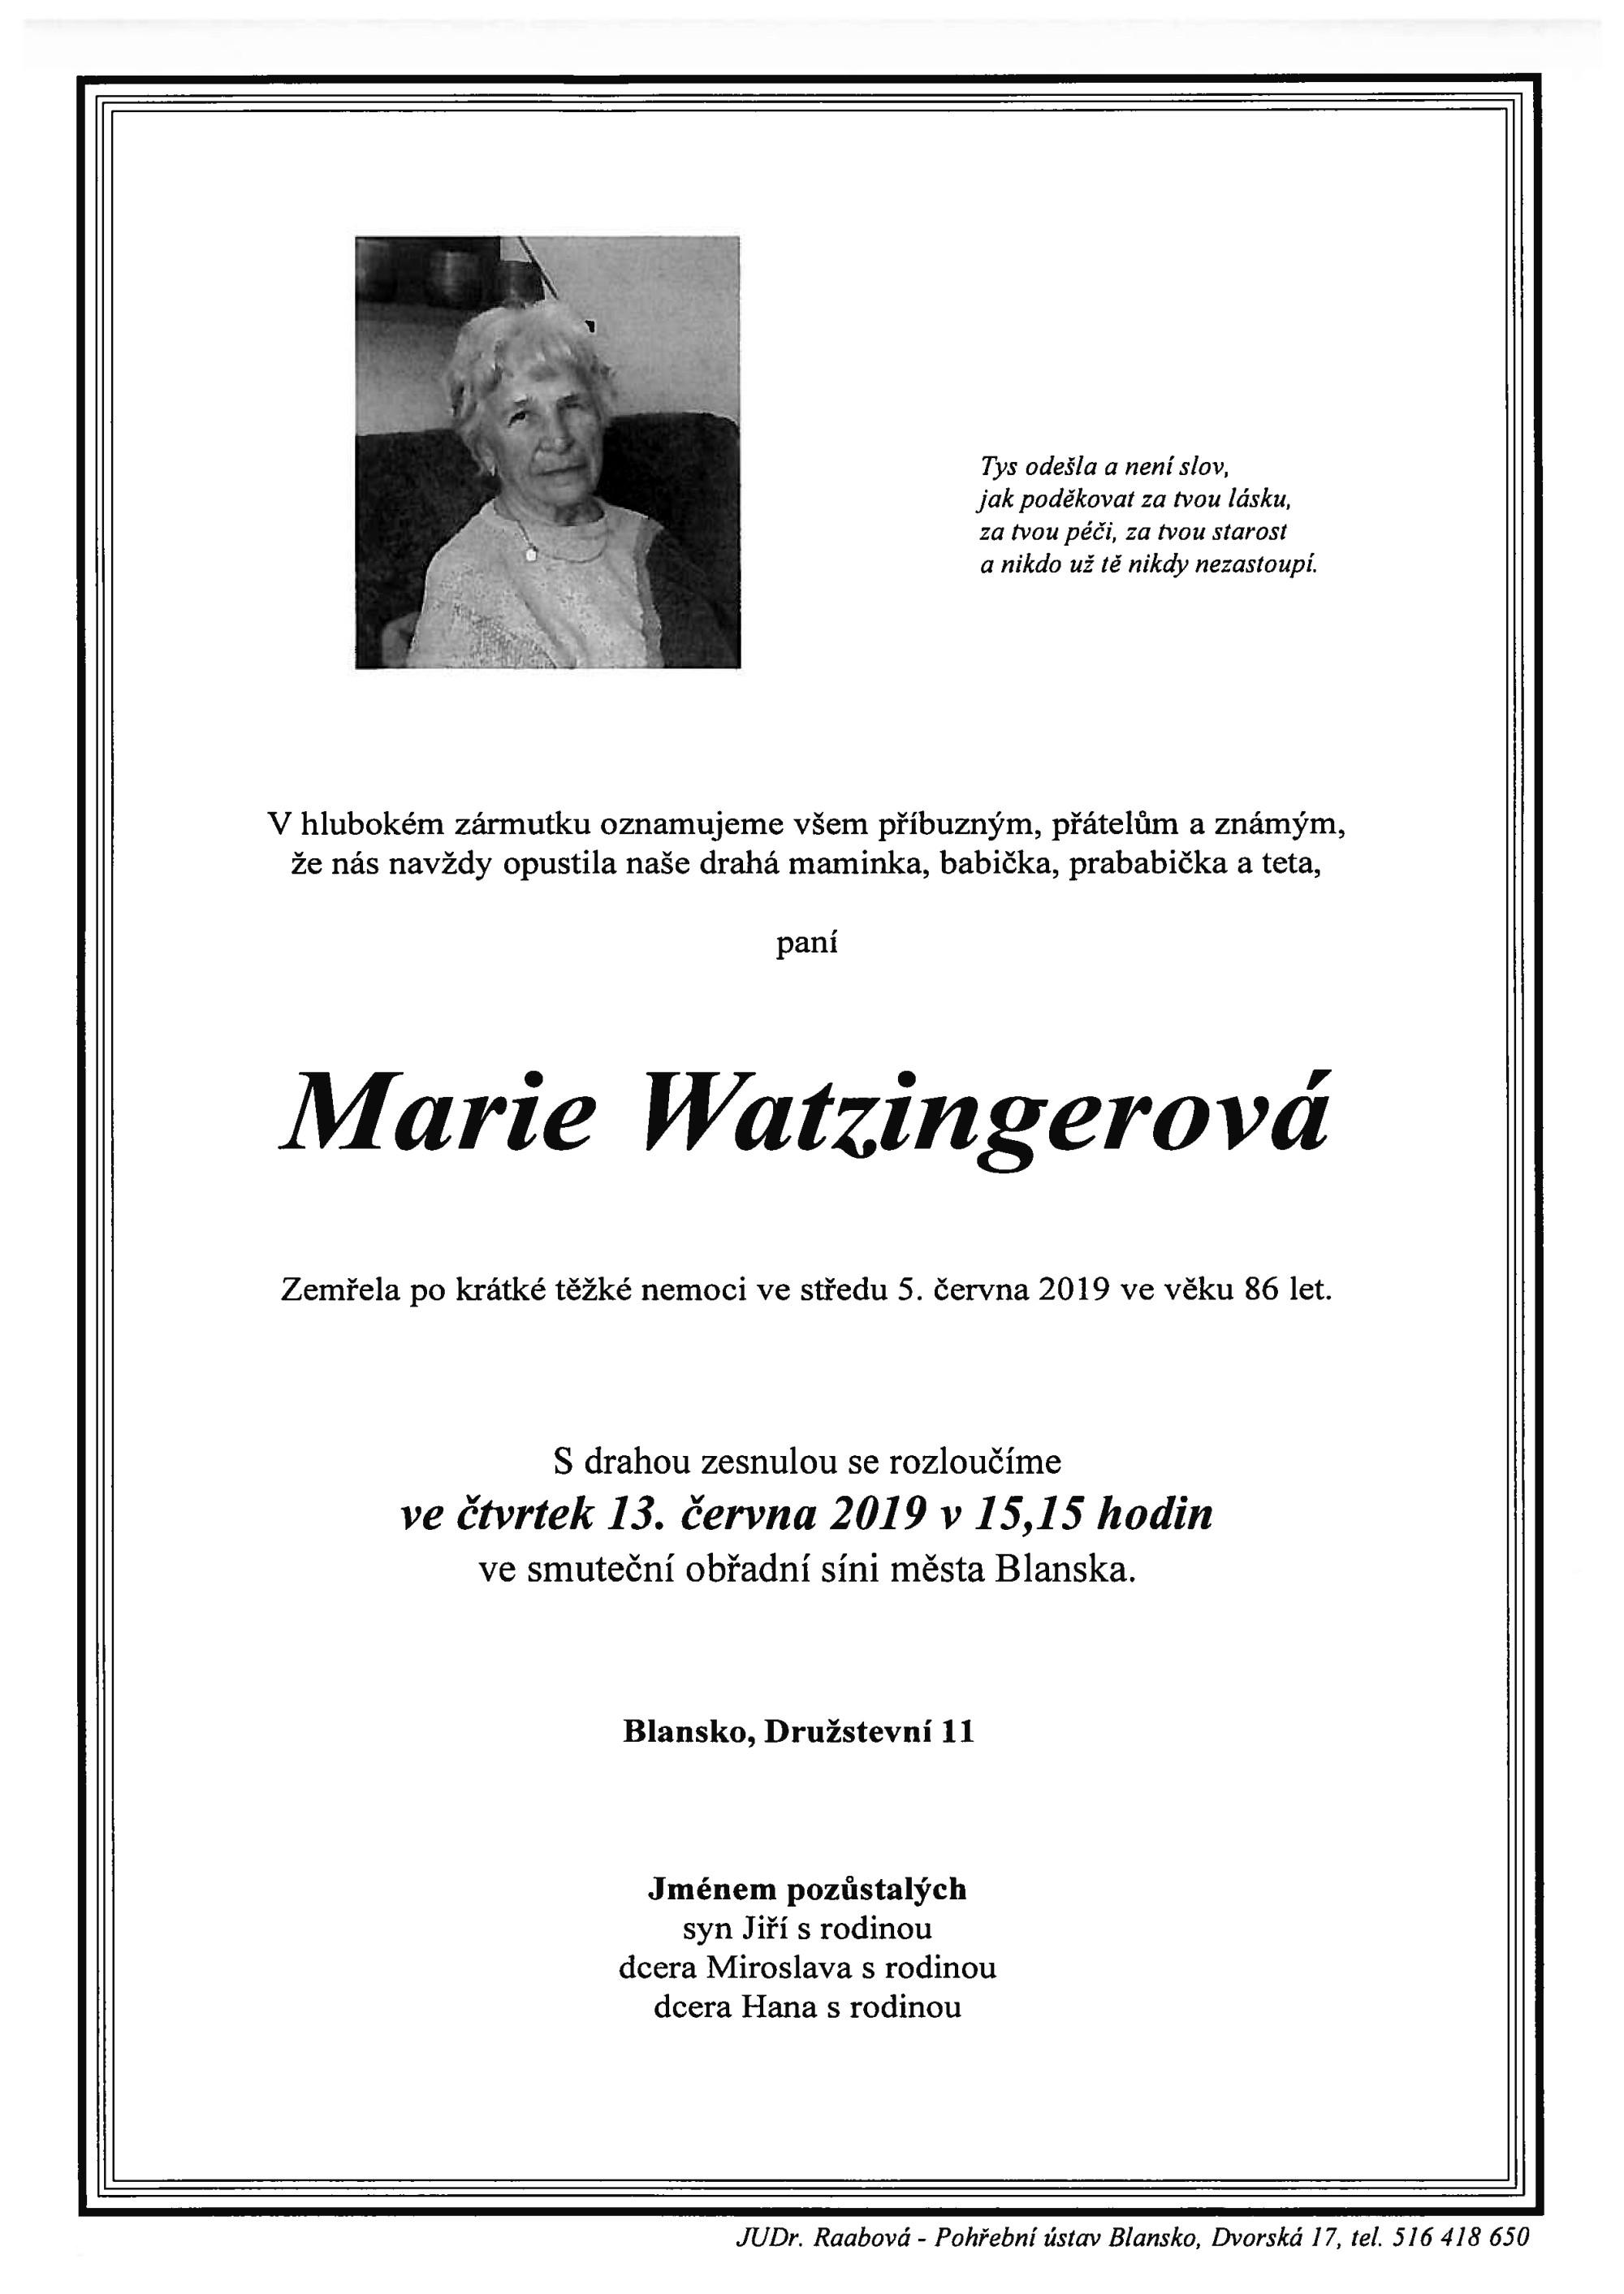 Marie Watzingerová